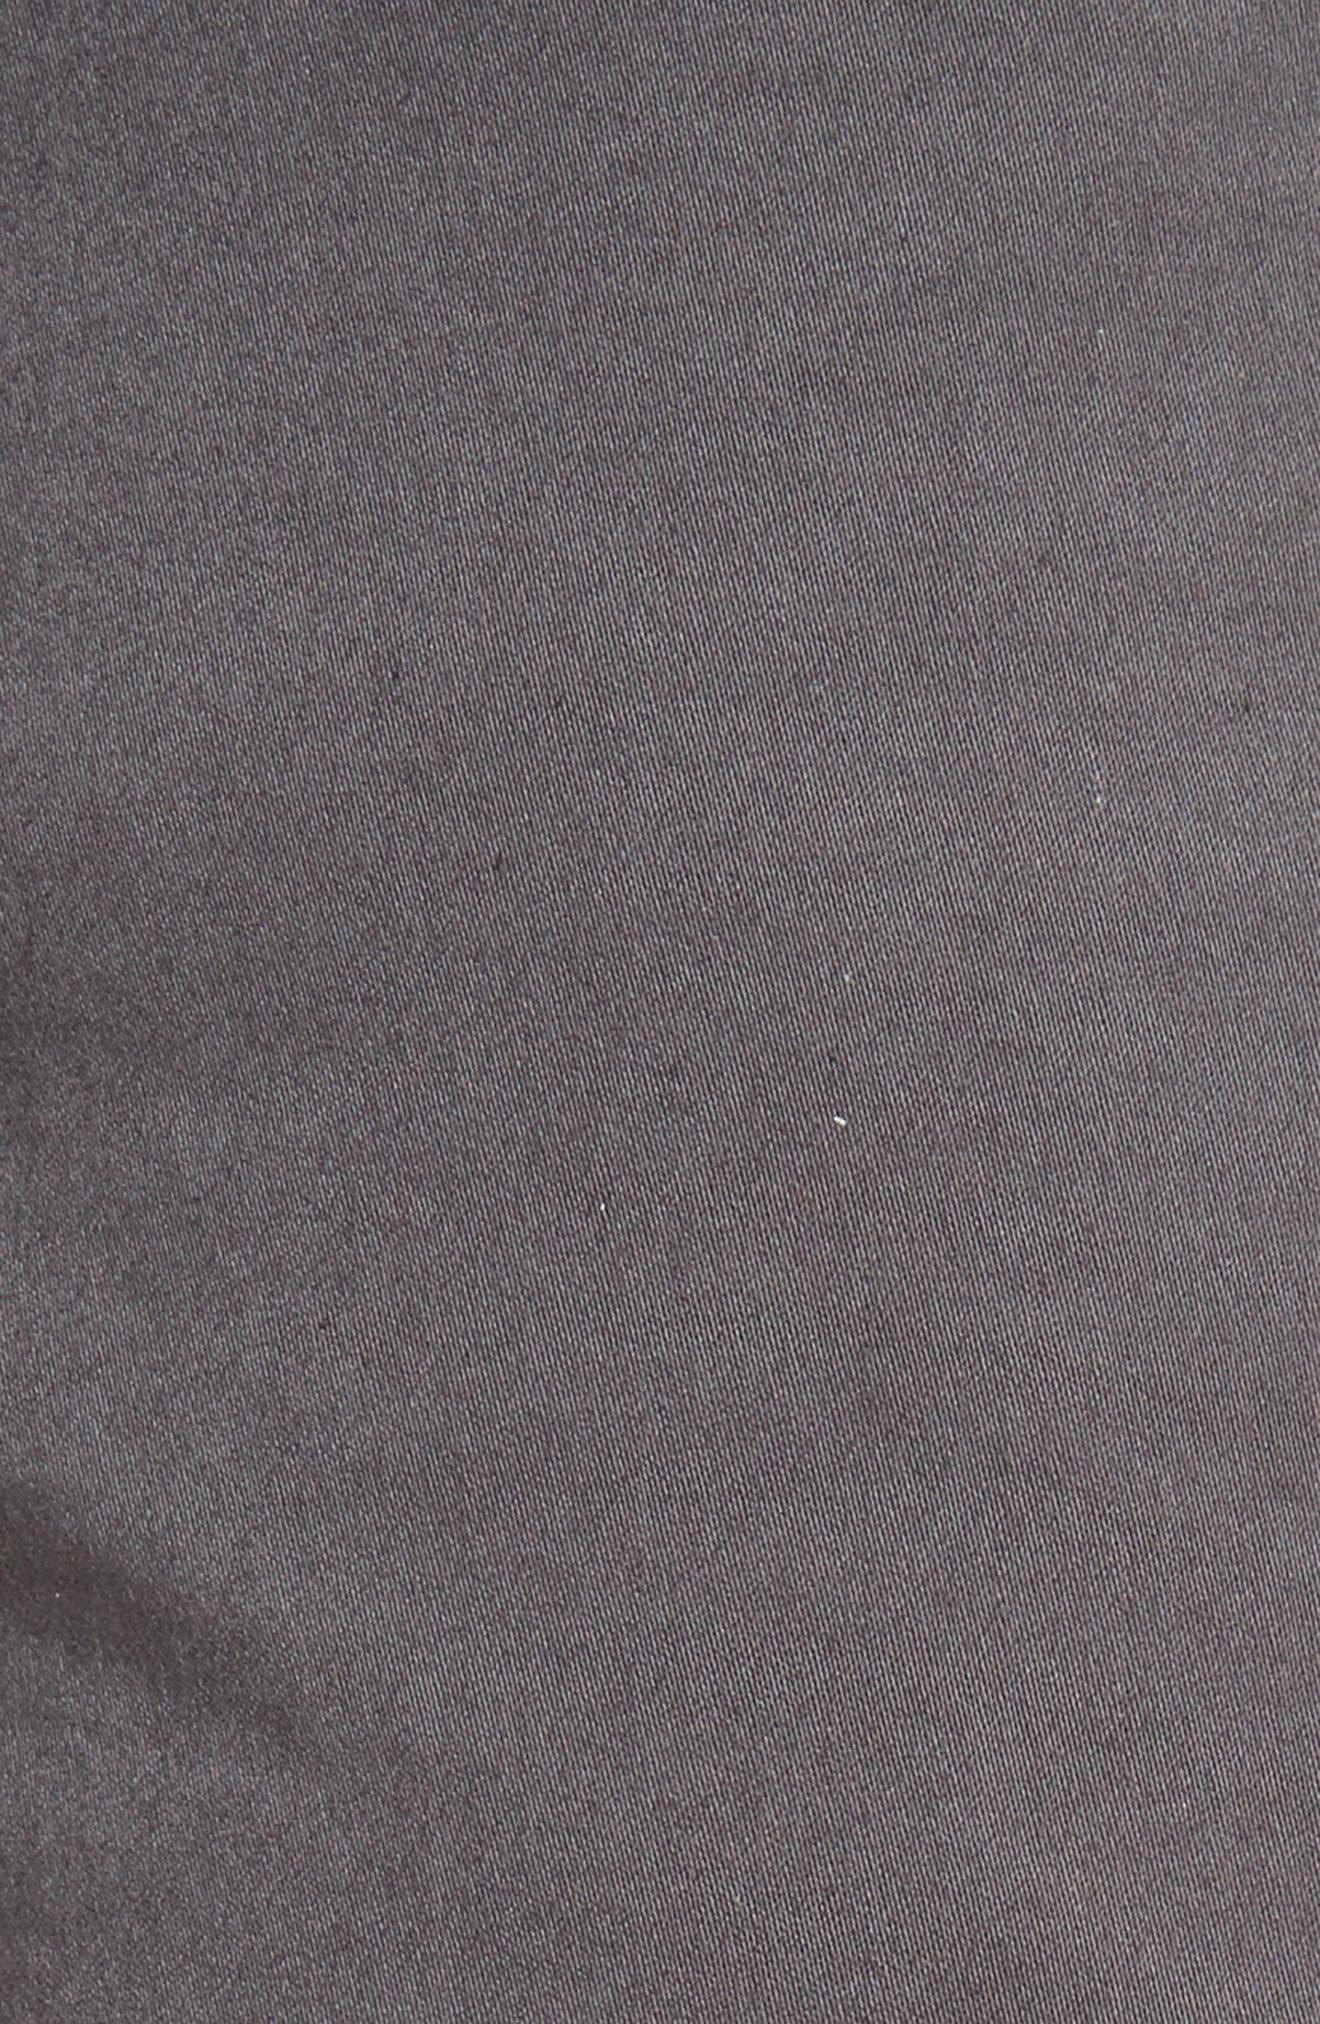 Alternate Image 5  - rag & bone Fit 2 Slim Five-Pocket Pants